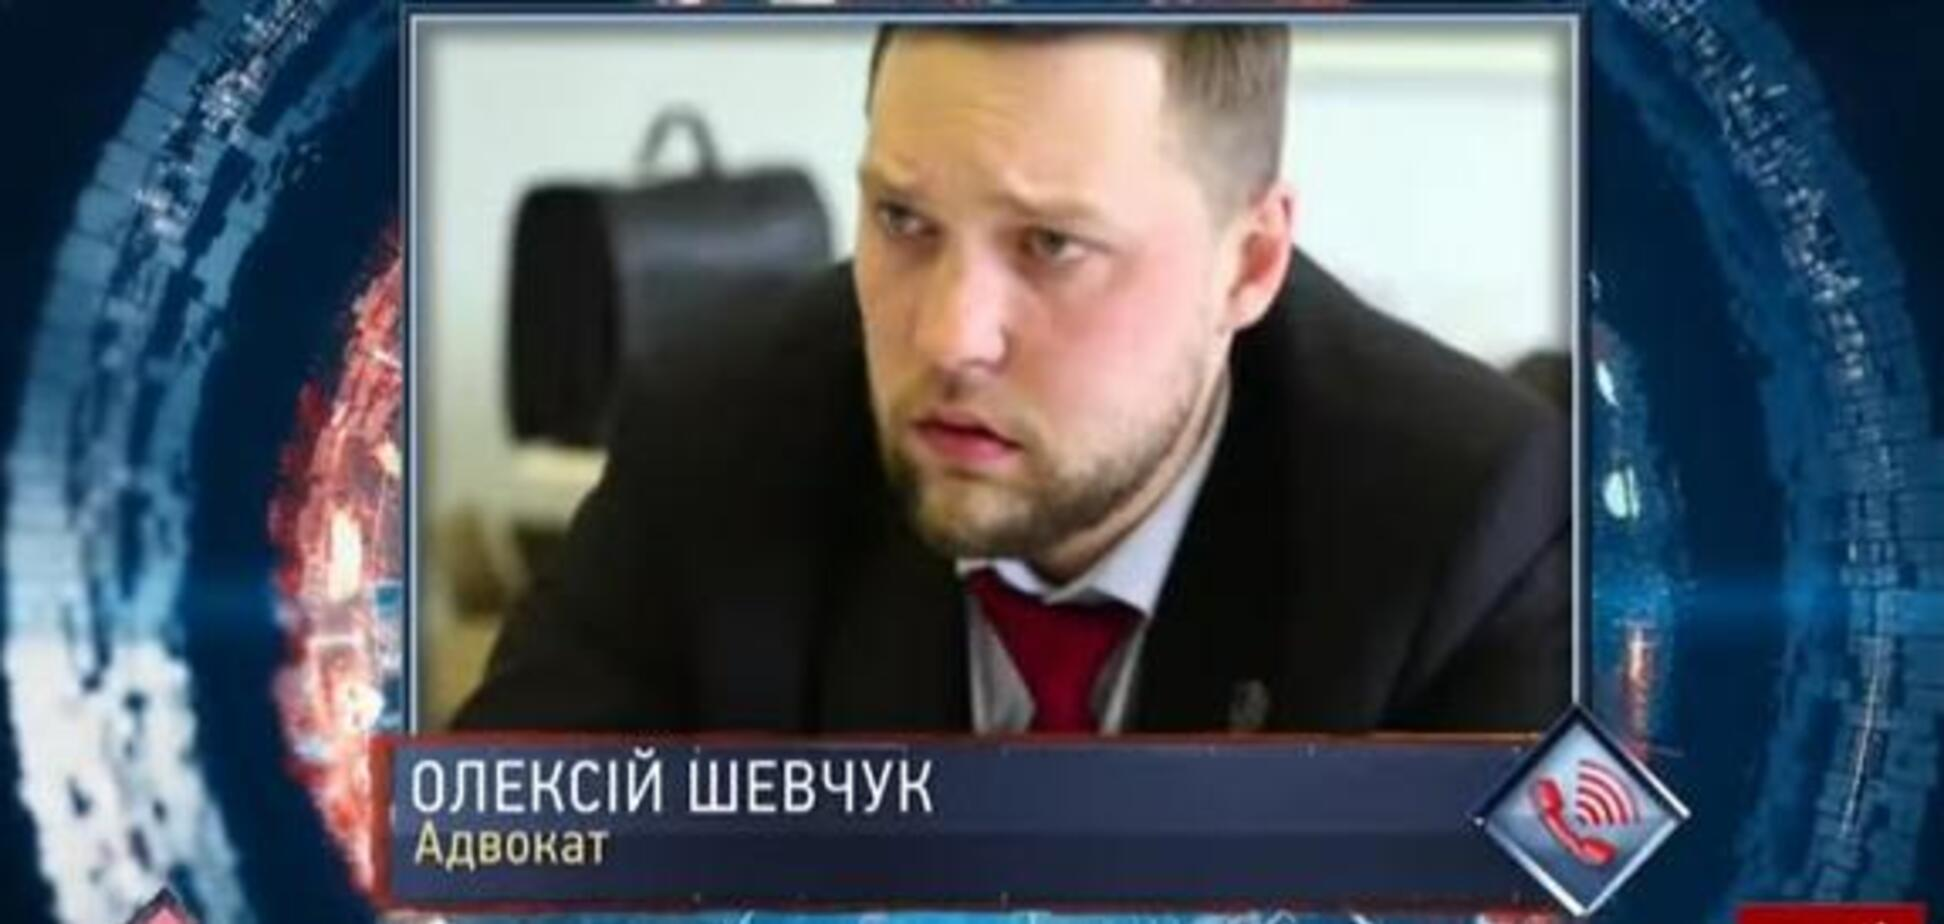 Олексій Шевчук в телеефірі